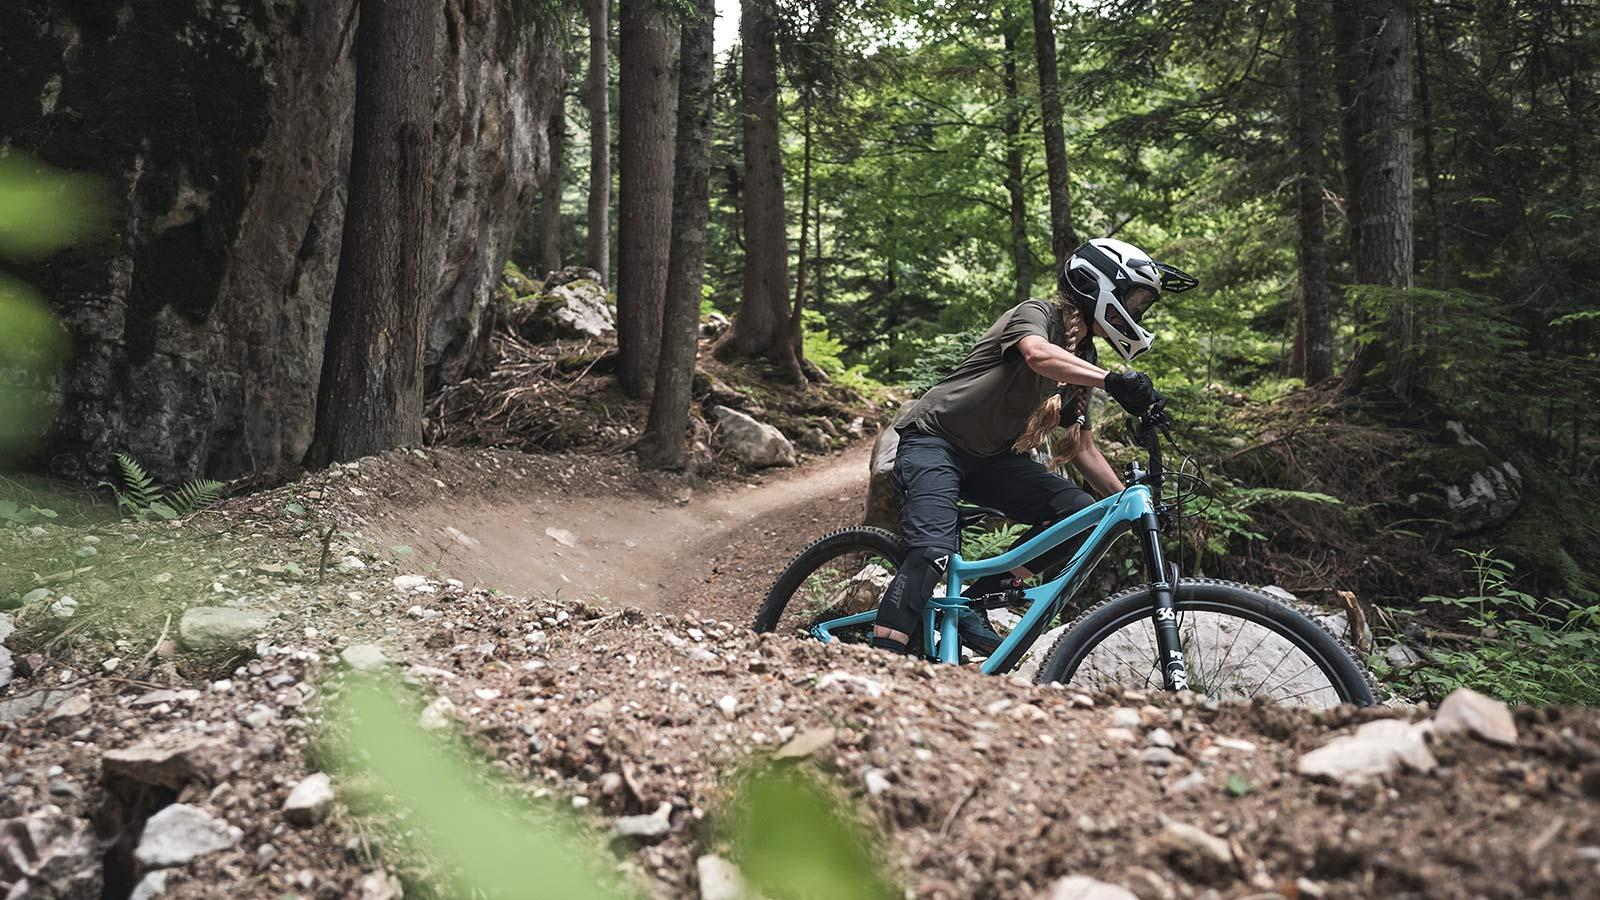 Dainese Linea 01 world's lightest full face helmet, lightweight MIPS DH MTB protection at 570g, Mountain Bike Connection rider Kasia Szlezak, photos by Rupert Fowler, riding